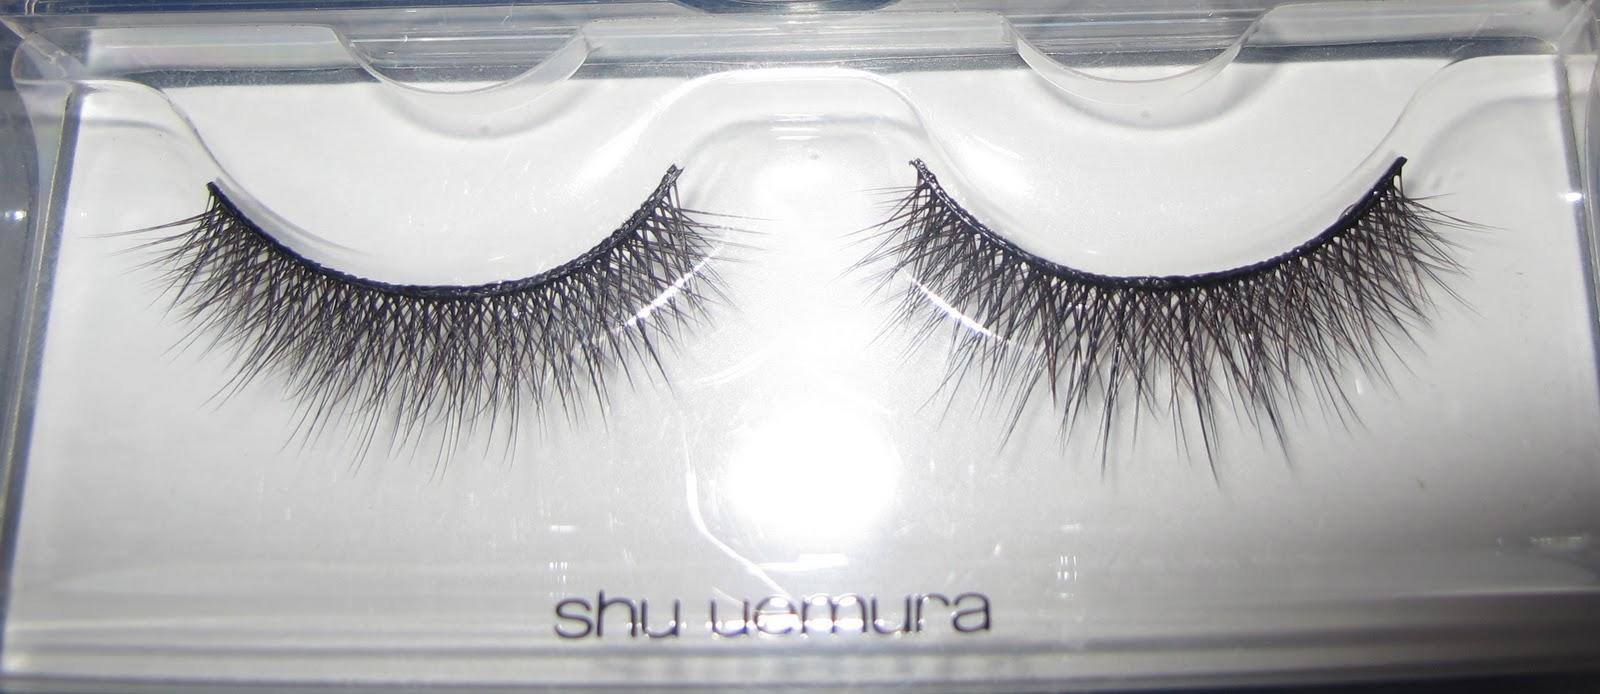 The Black Panties Shu Uemura Smoky Layers False Eyelashes